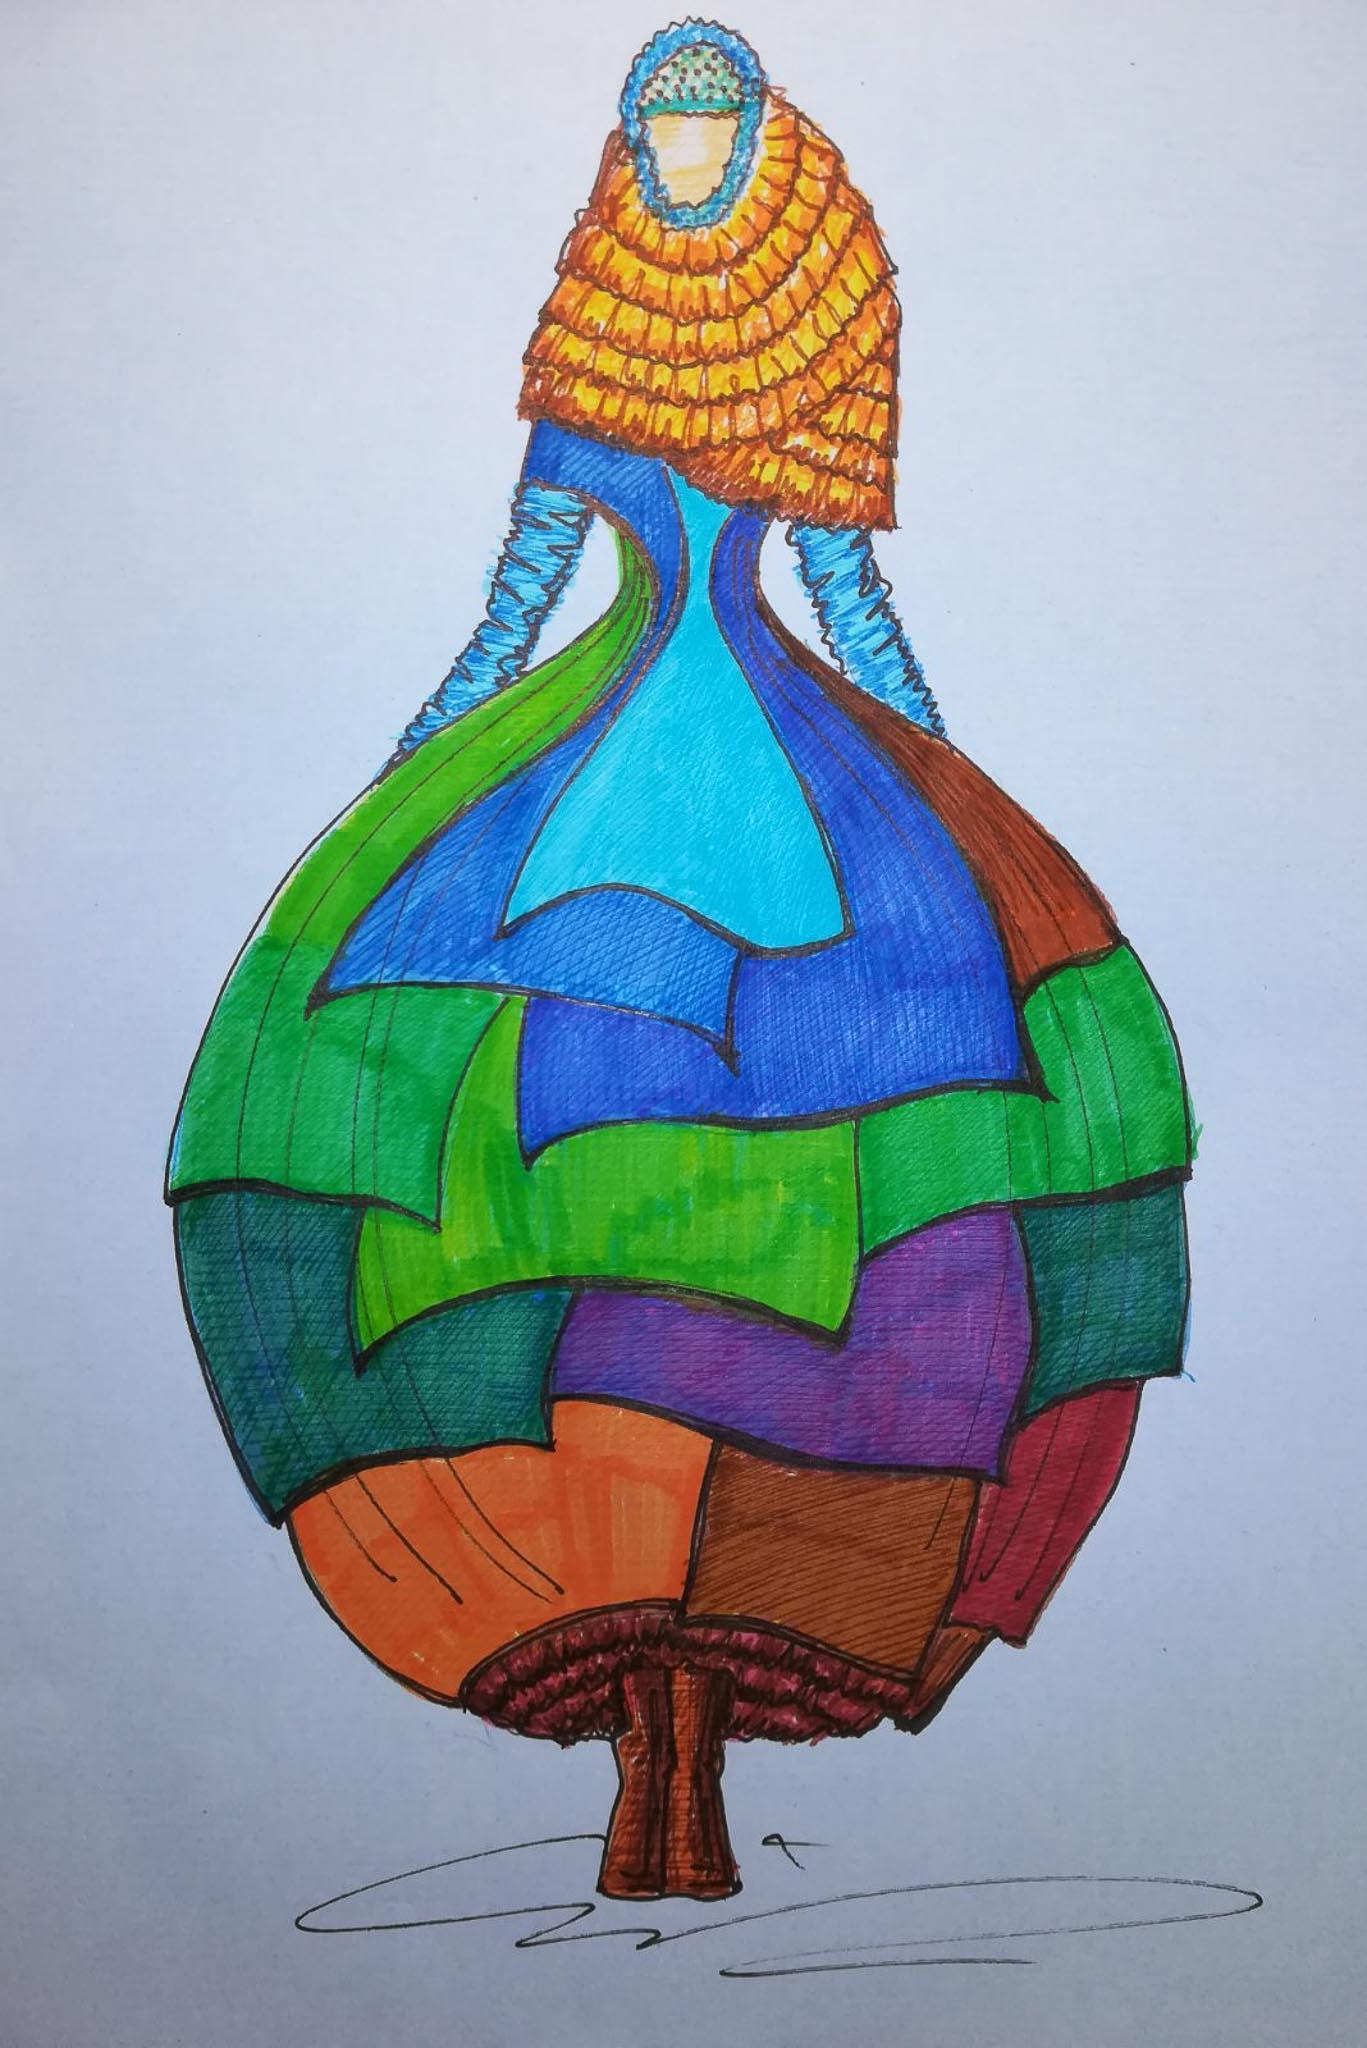 Armor for the Soul: Zorina Iryna, Ukraine, Newcomer, OTHTY (Dream your Dreams)